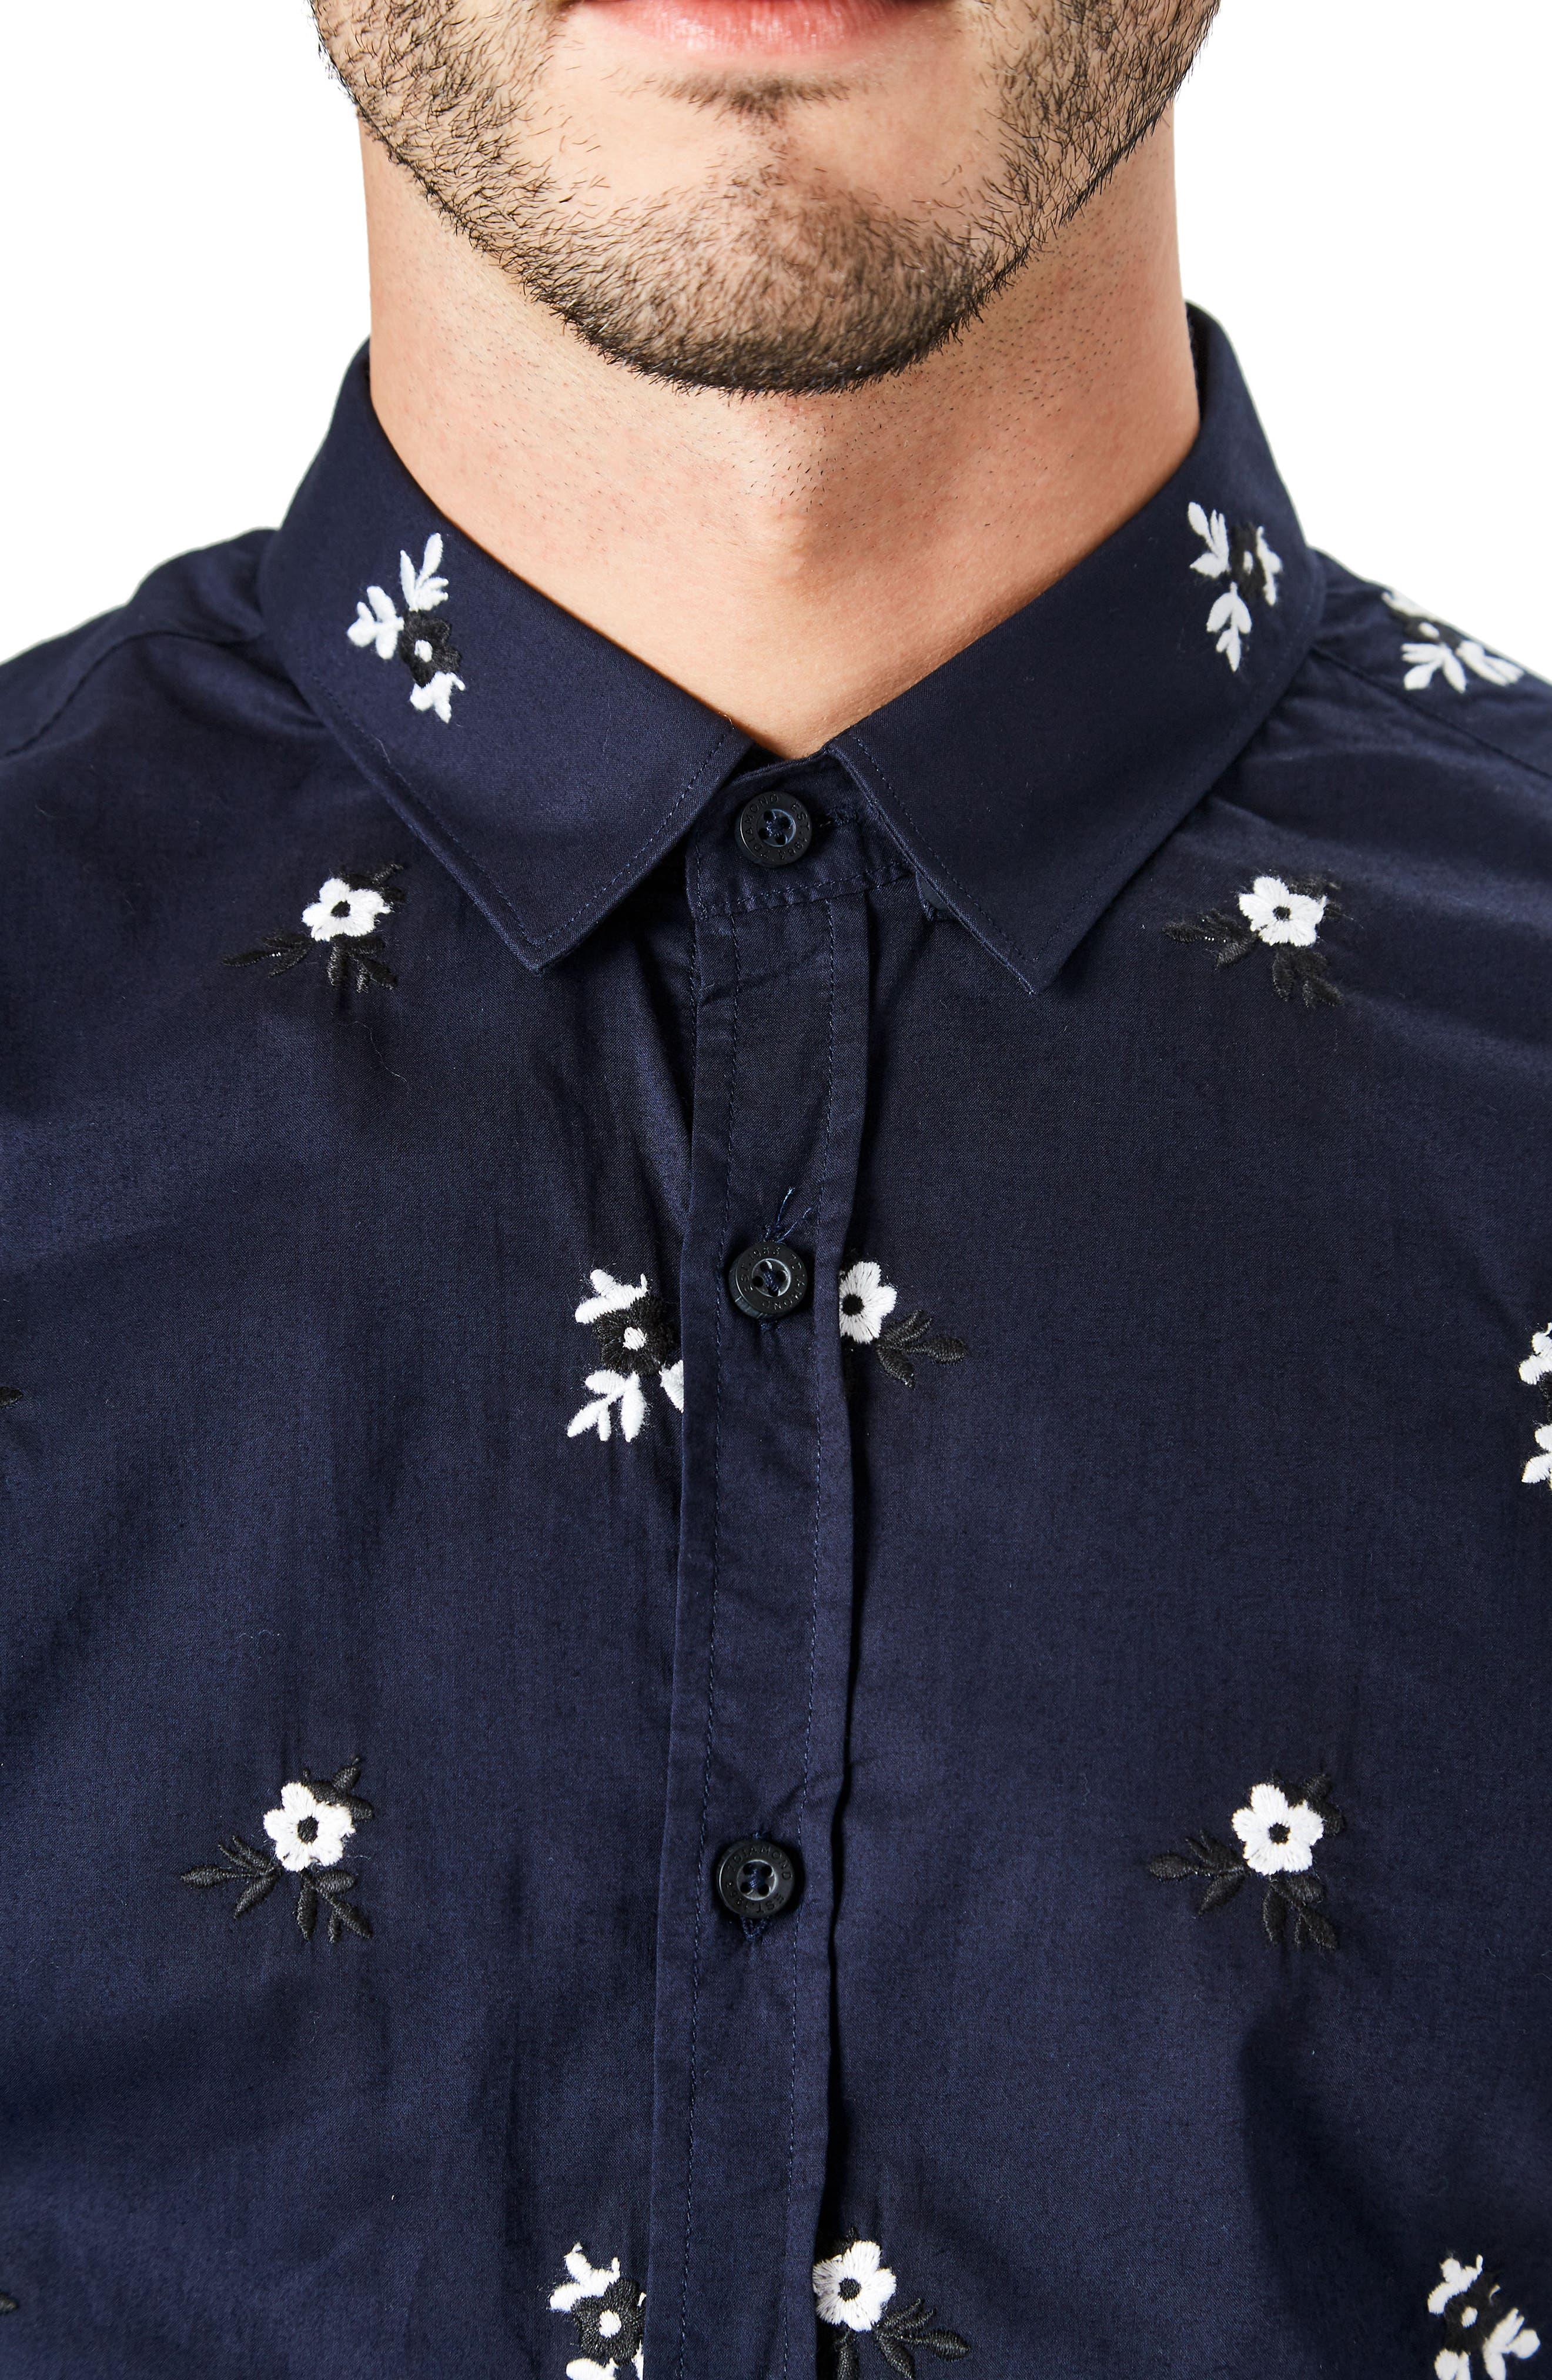 Isolator Woven Shirt,                             Alternate thumbnail 4, color,                             NAVY